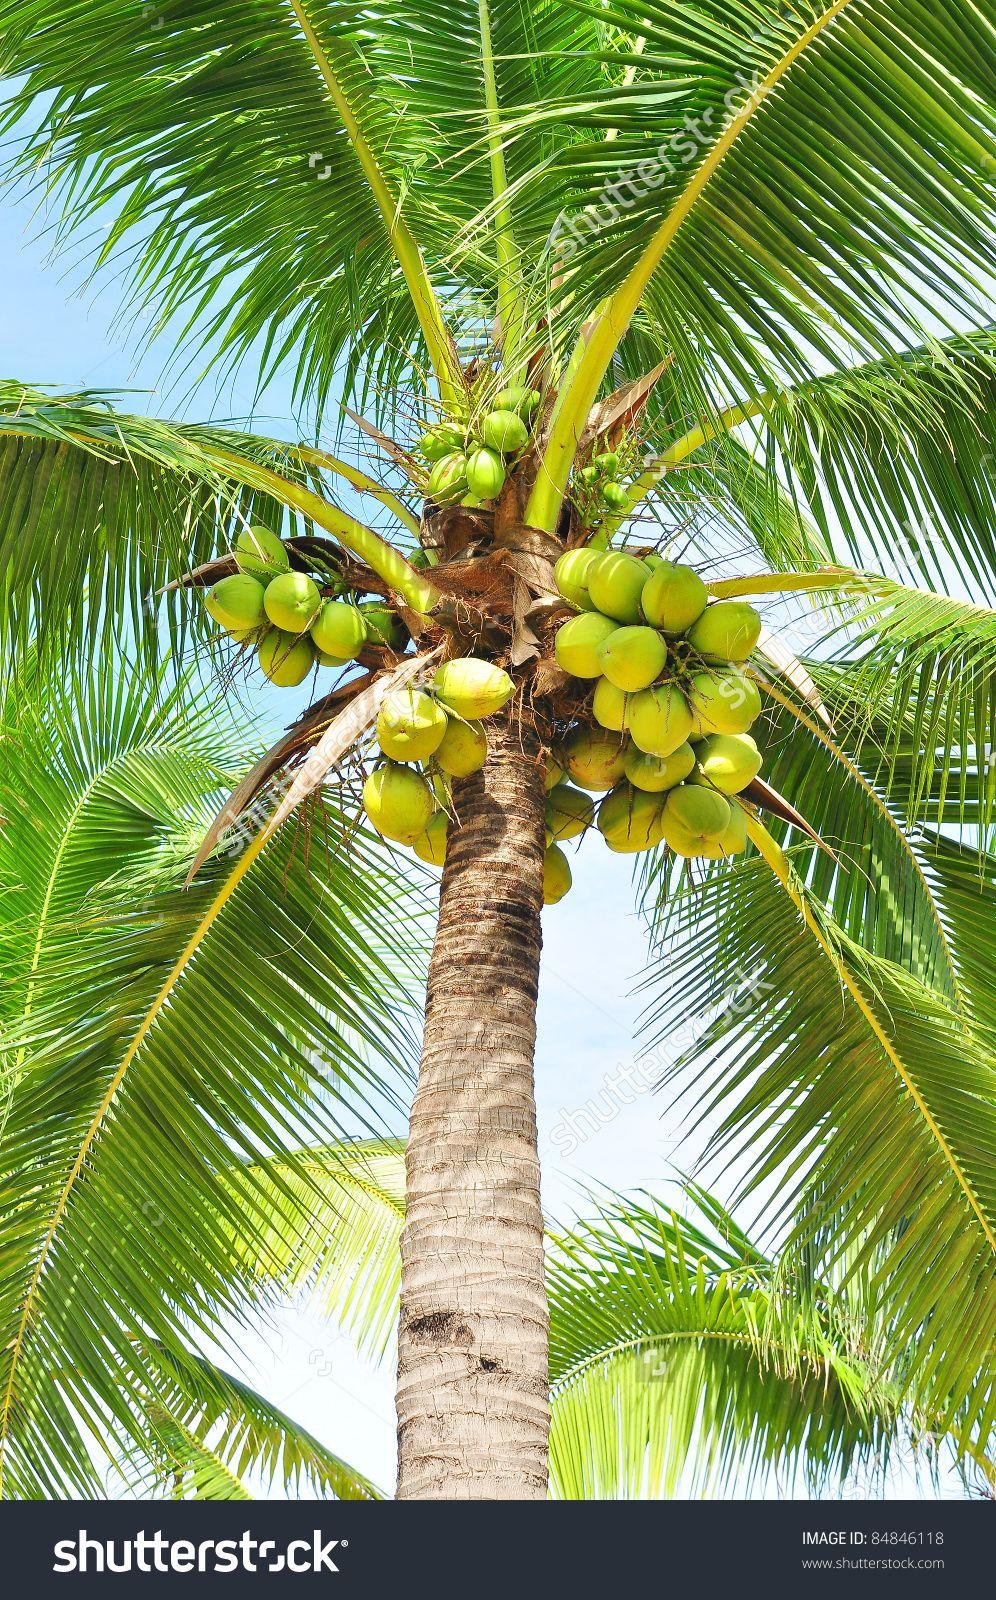 Kokospalm, Coconut tree Growing vegetables, Nature, Flex